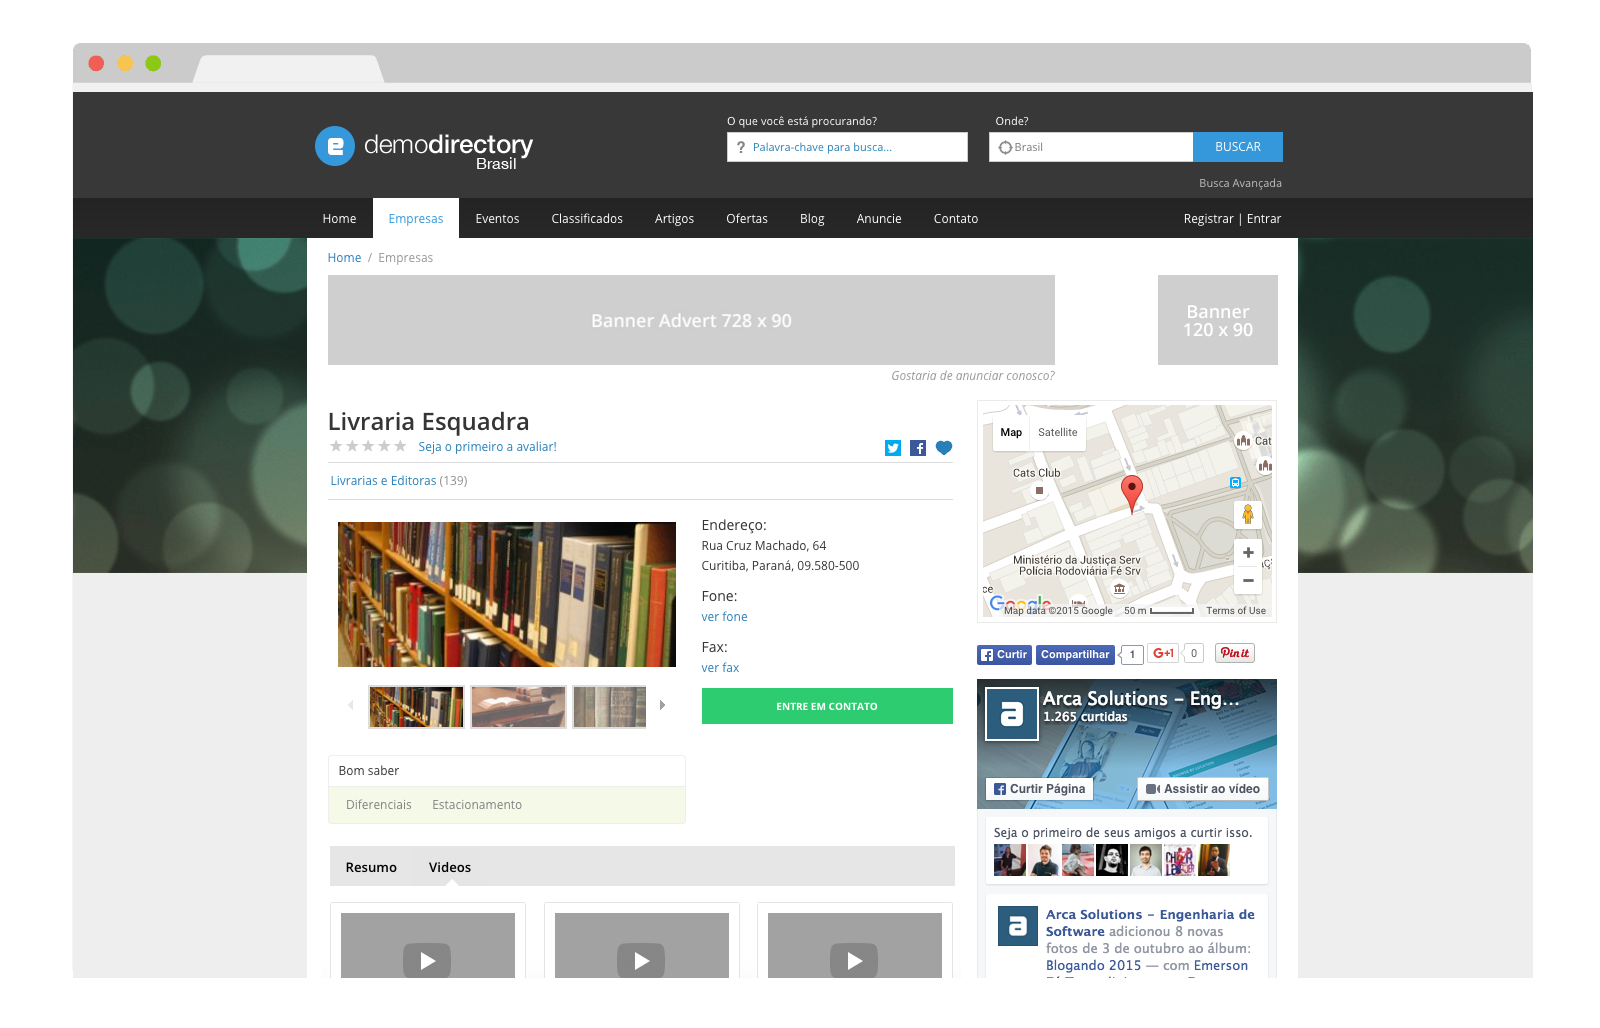 eDirectory Múltiplos Videos para Empresas